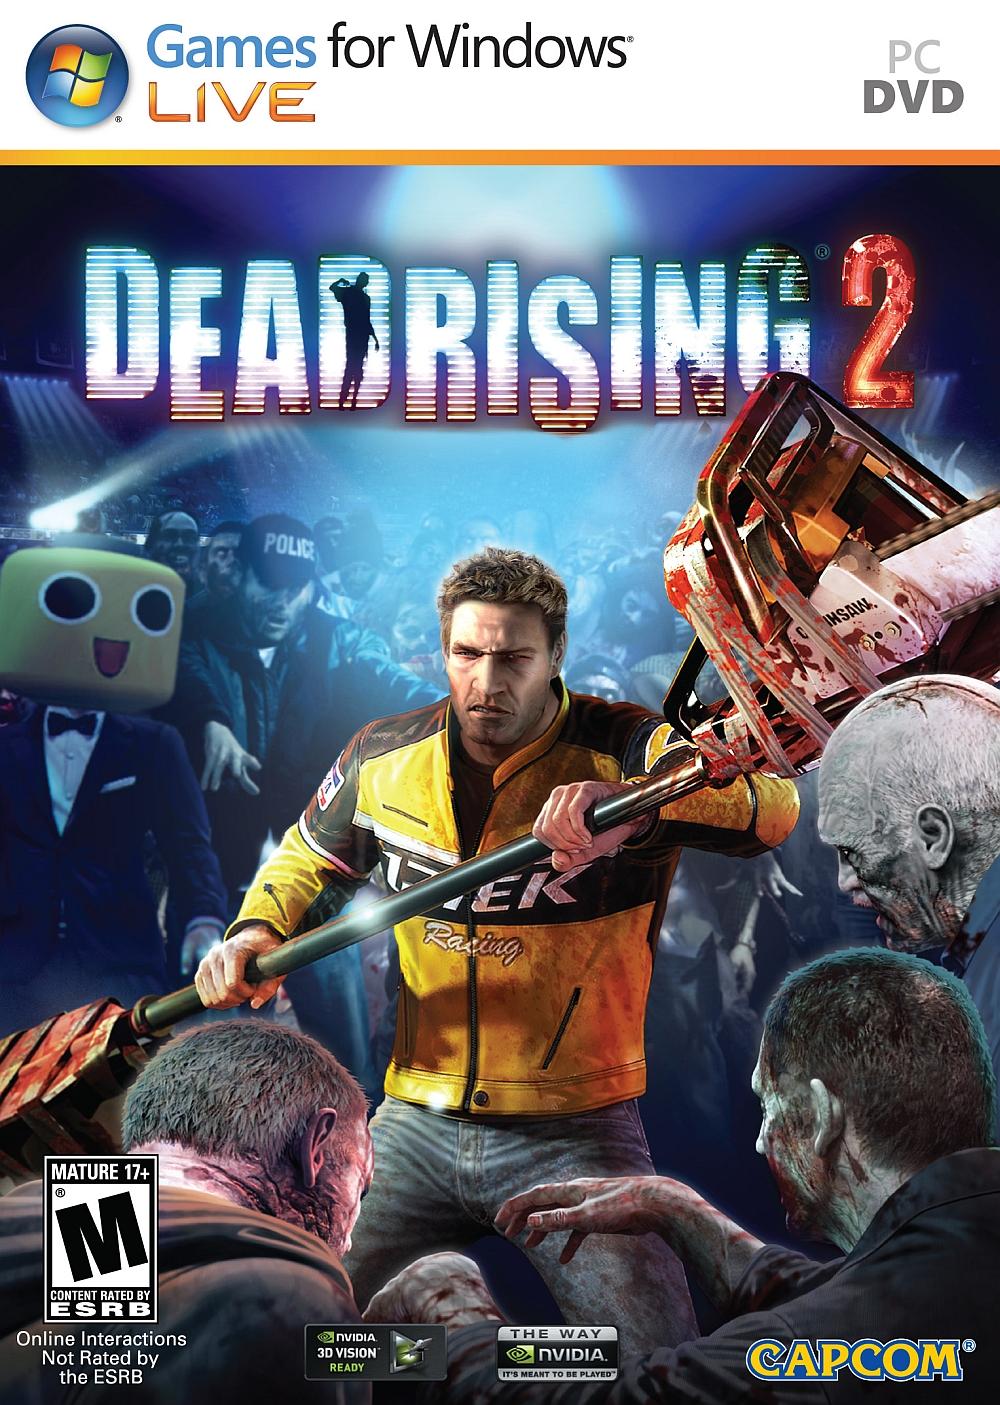 deadrising2pcm - Dead Rising 2 PC